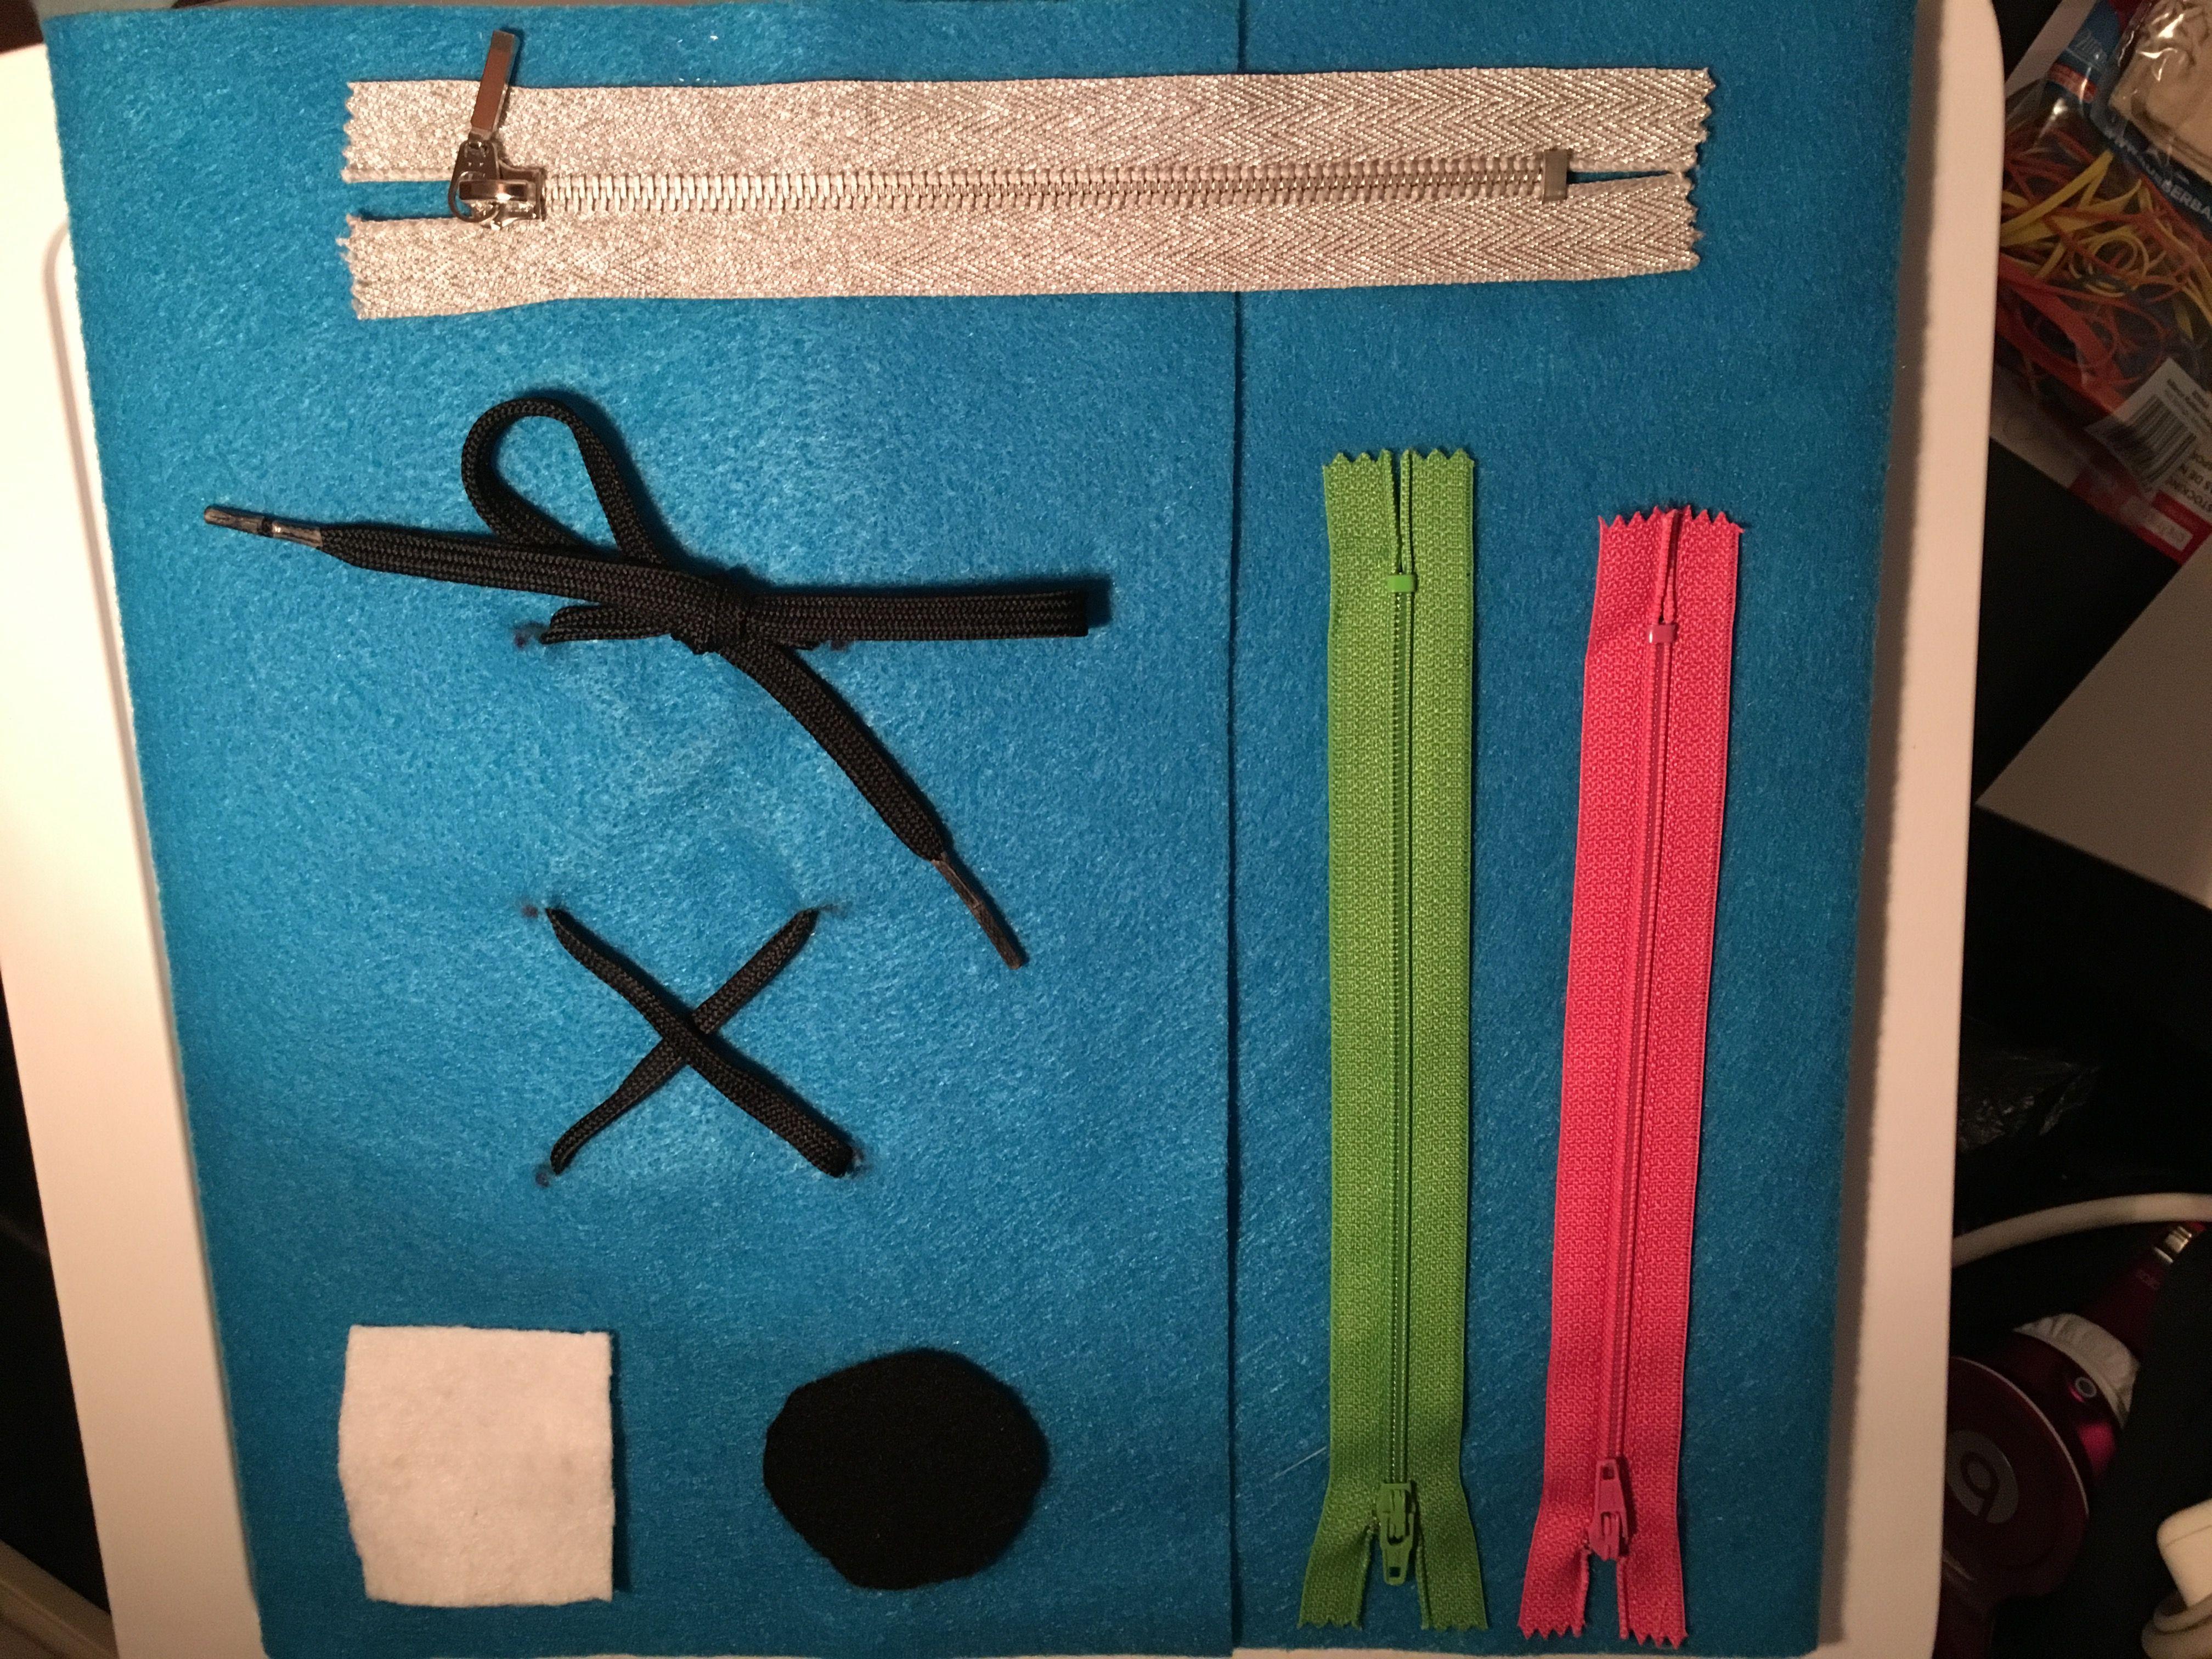 Occupational therapy- dressing board | OT stuff | Pinterest ...